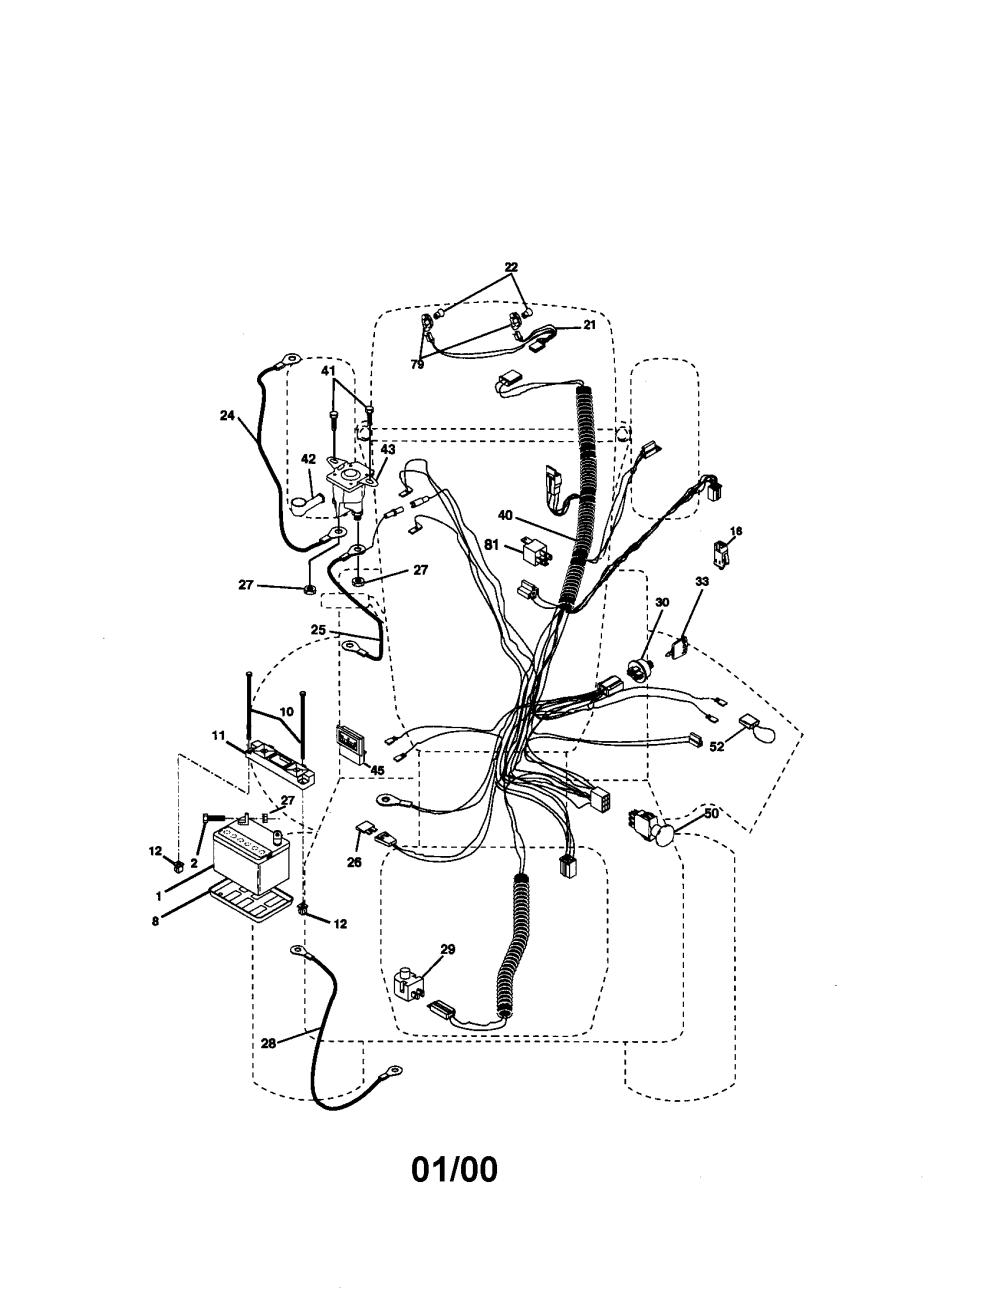 medium resolution of craftsman 917272950 electrical diagram